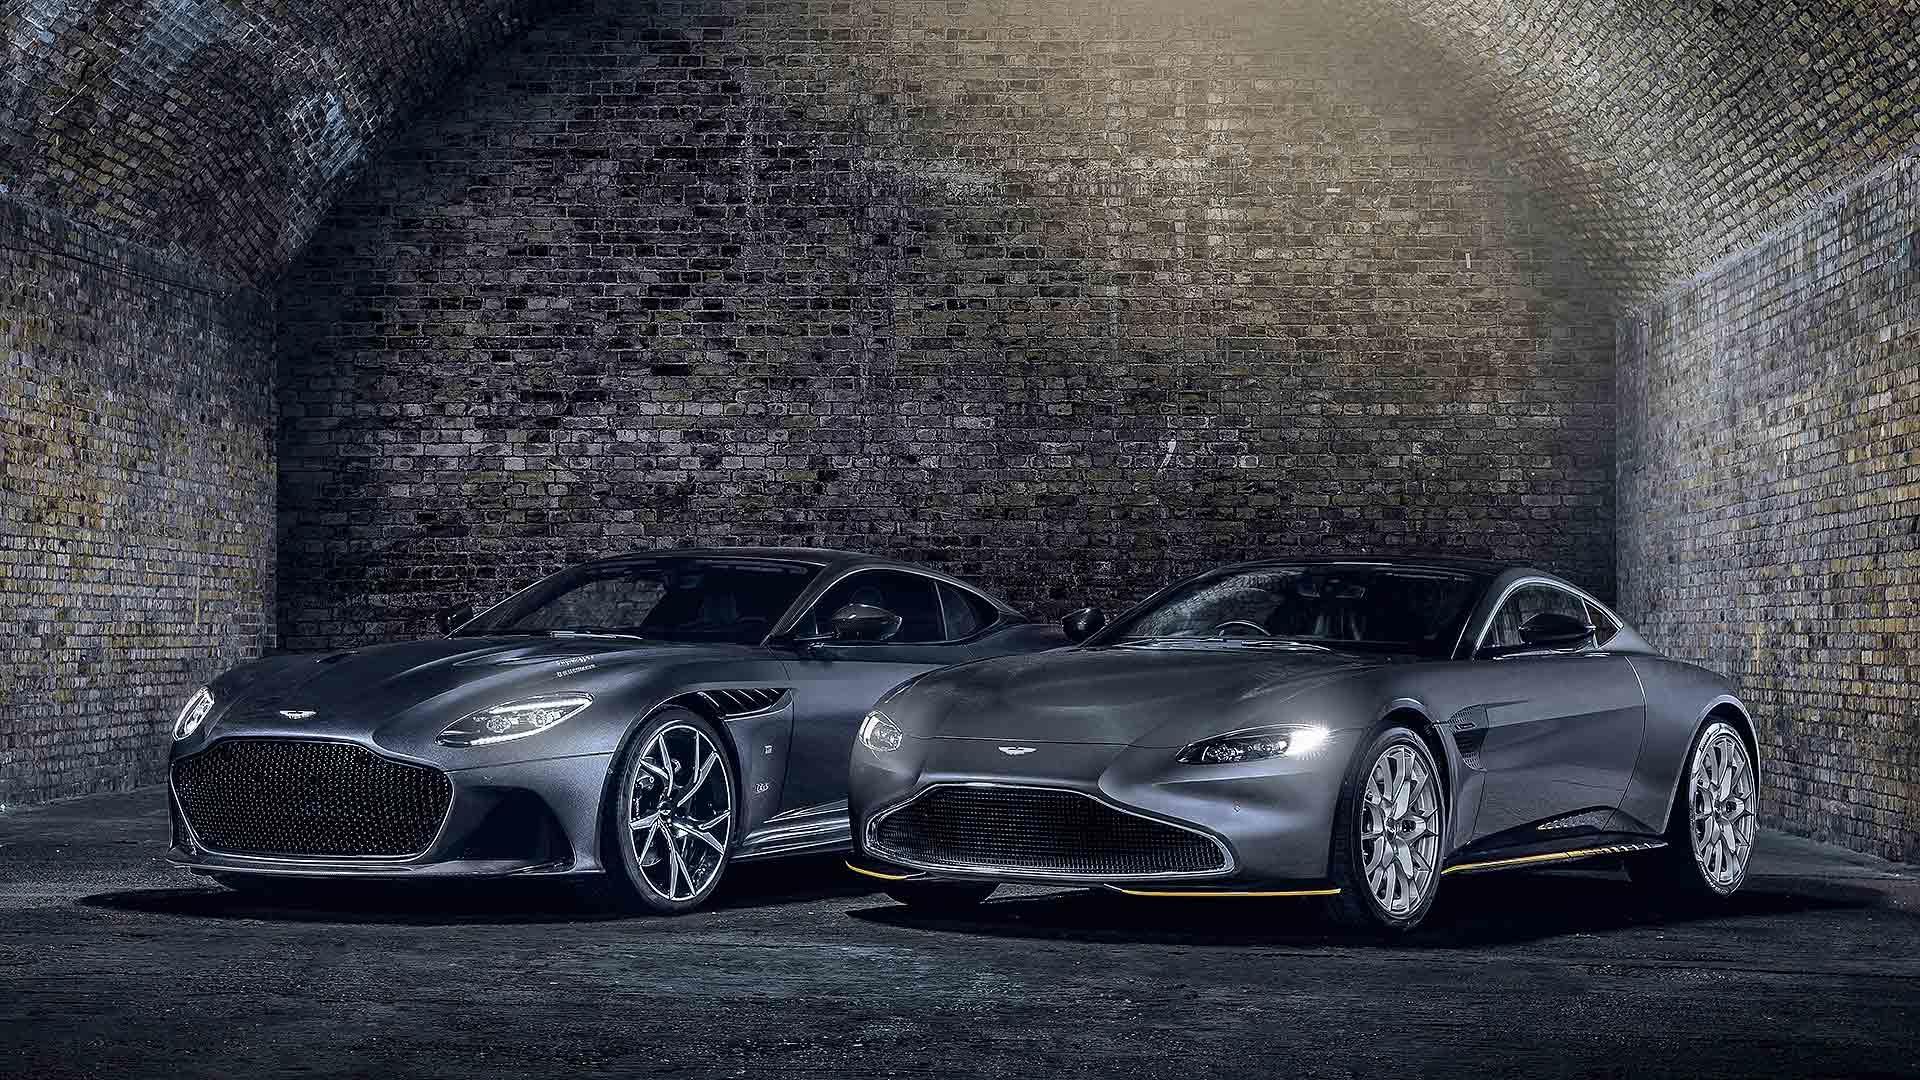 Aston Martin Vantage 007 Edition and DBS Superleggera 007 Edition